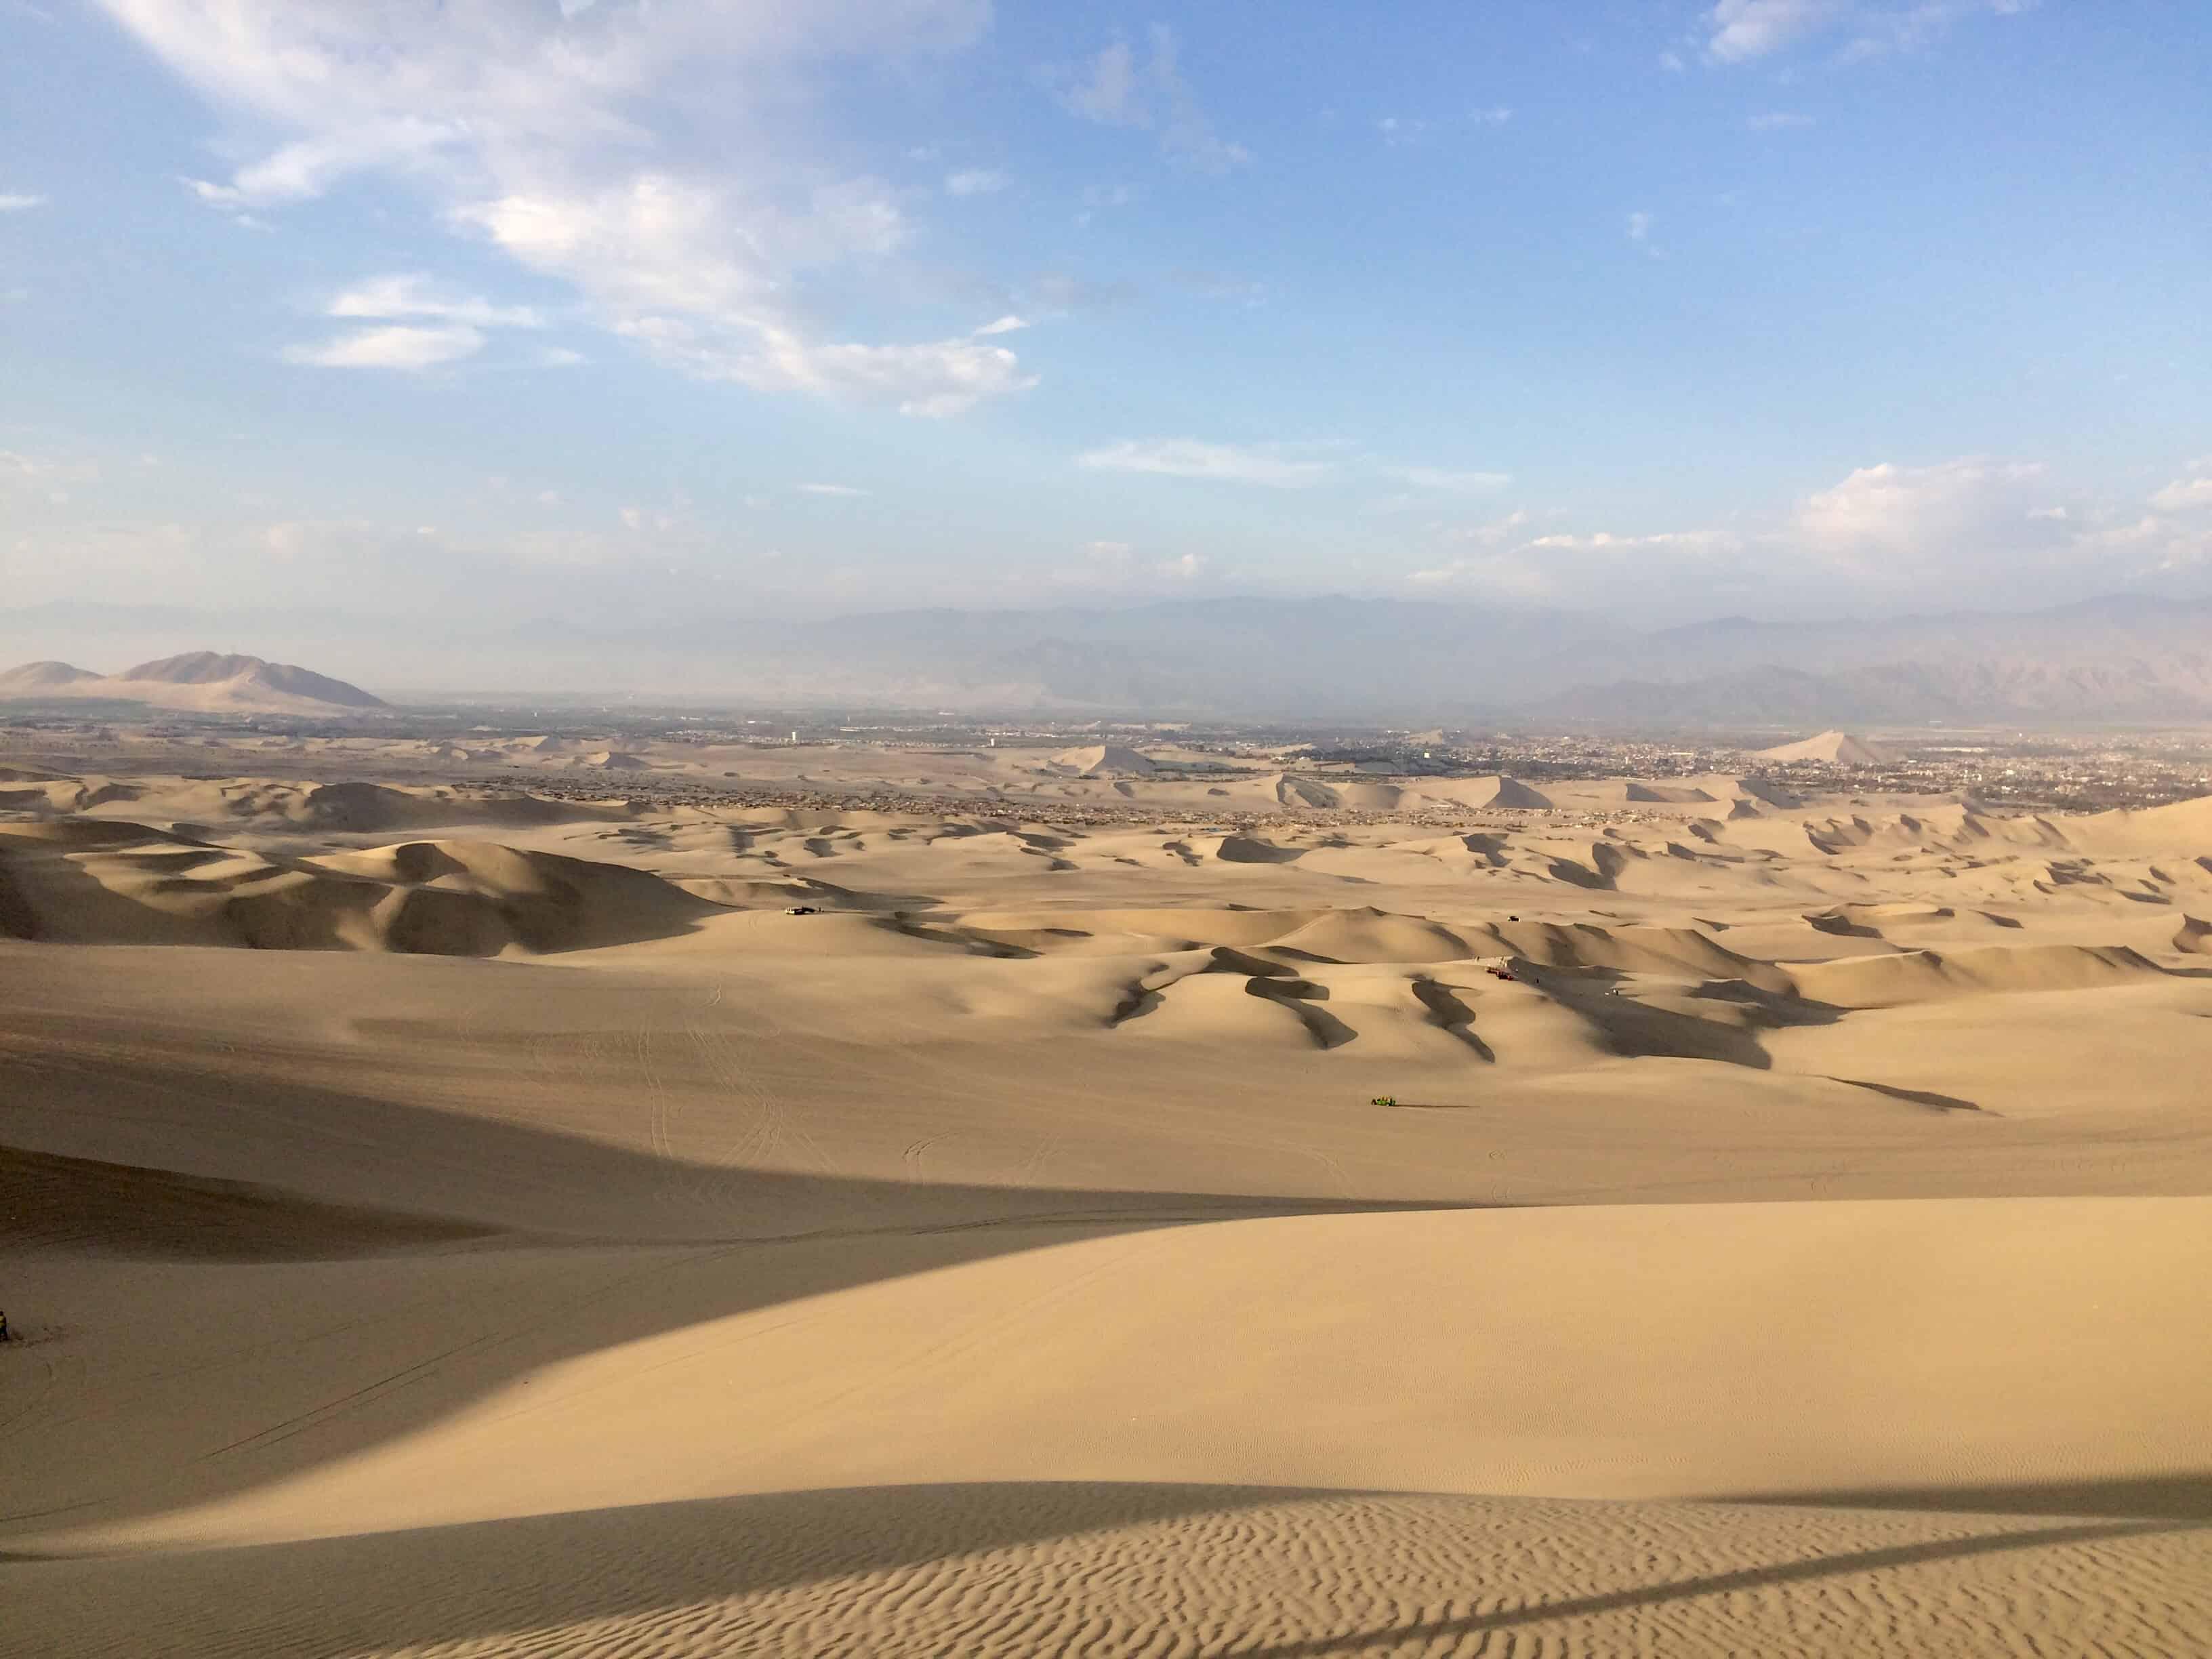 Reserve naturelle-dunes-desert-ica-sable-soleil